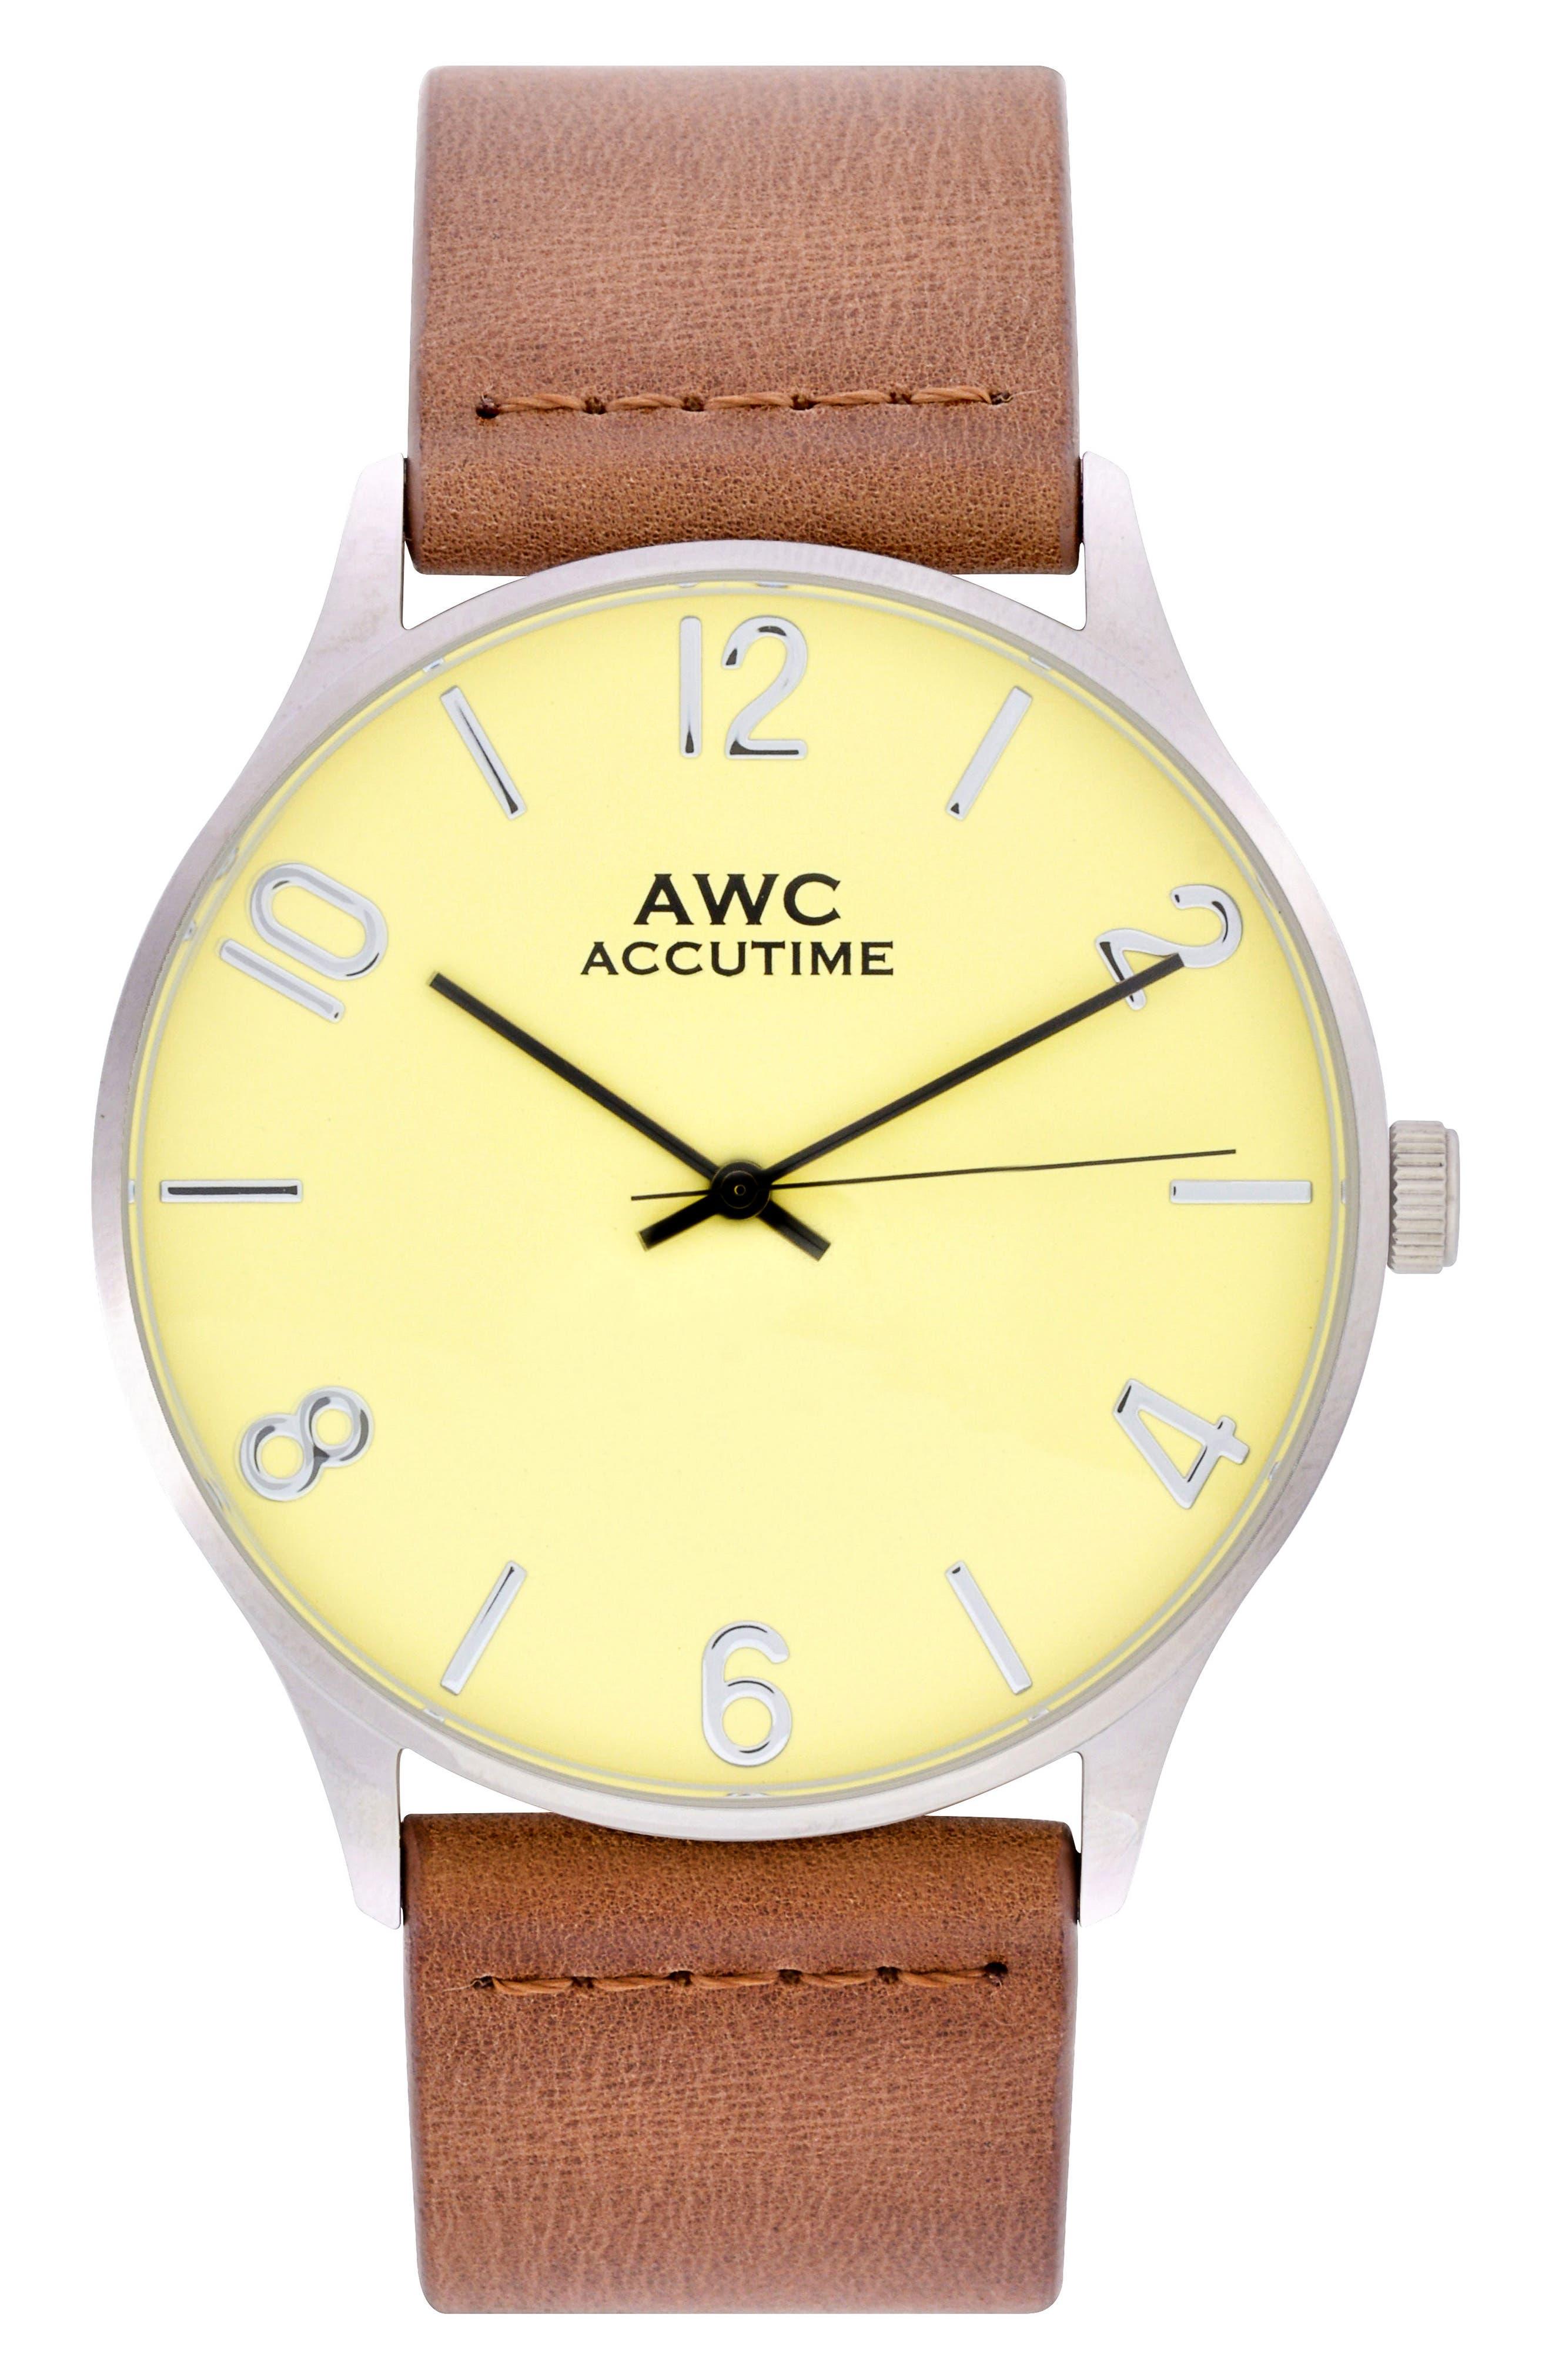 Accutime Numerial Suede Strap Watch, 42mm